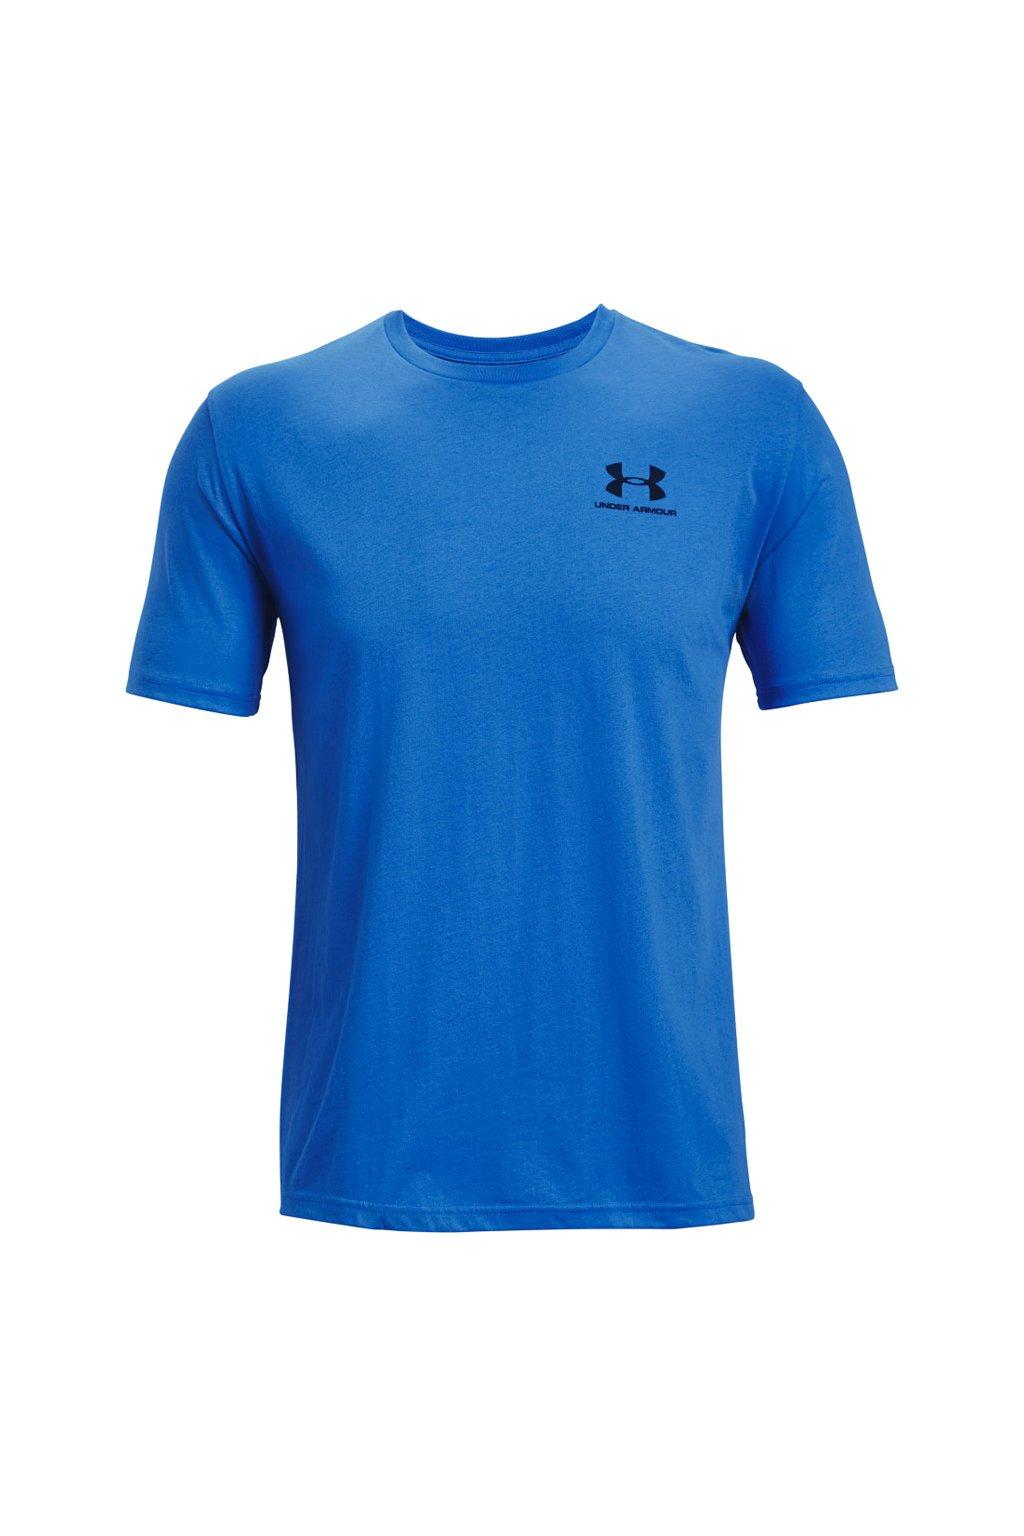 Pánske tričko Under Armour Sportstyle LC SS denim 1326799 787